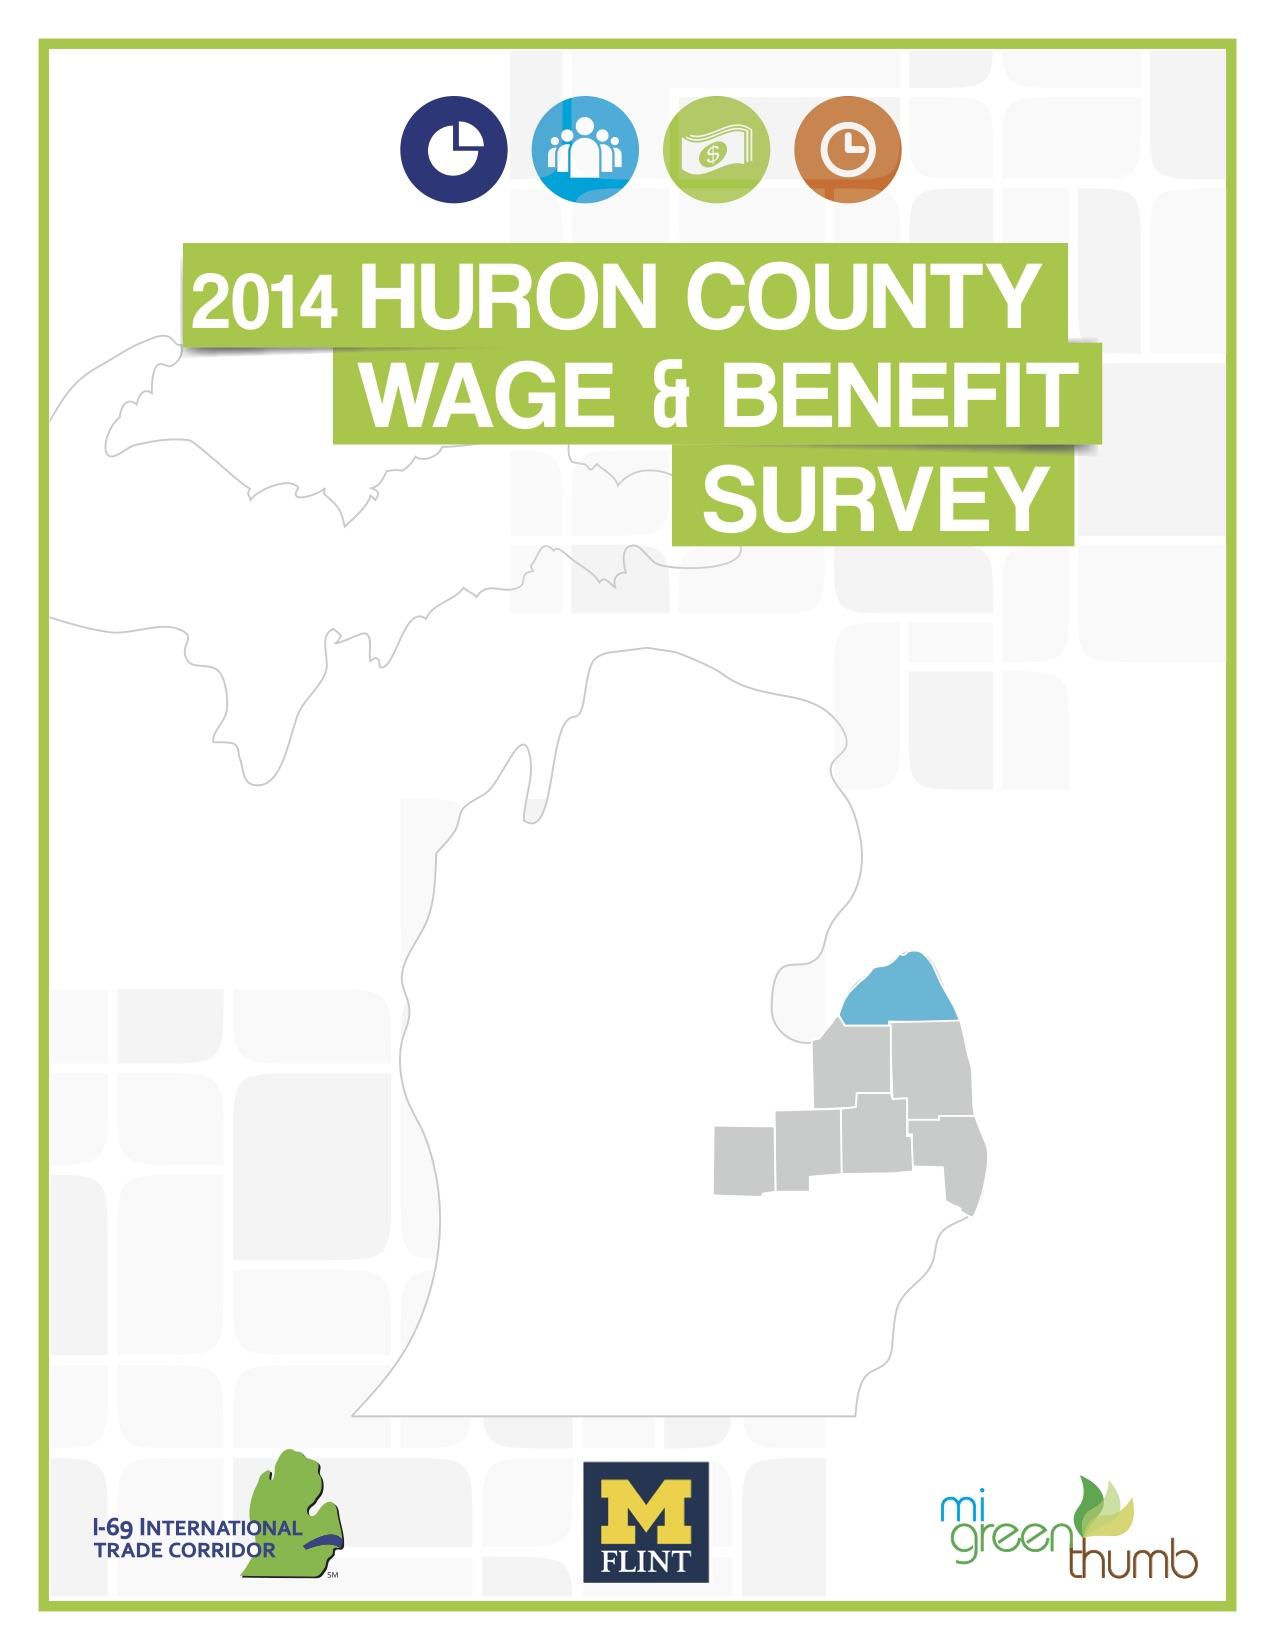 2014 Huron County Wage & Benefit Survey